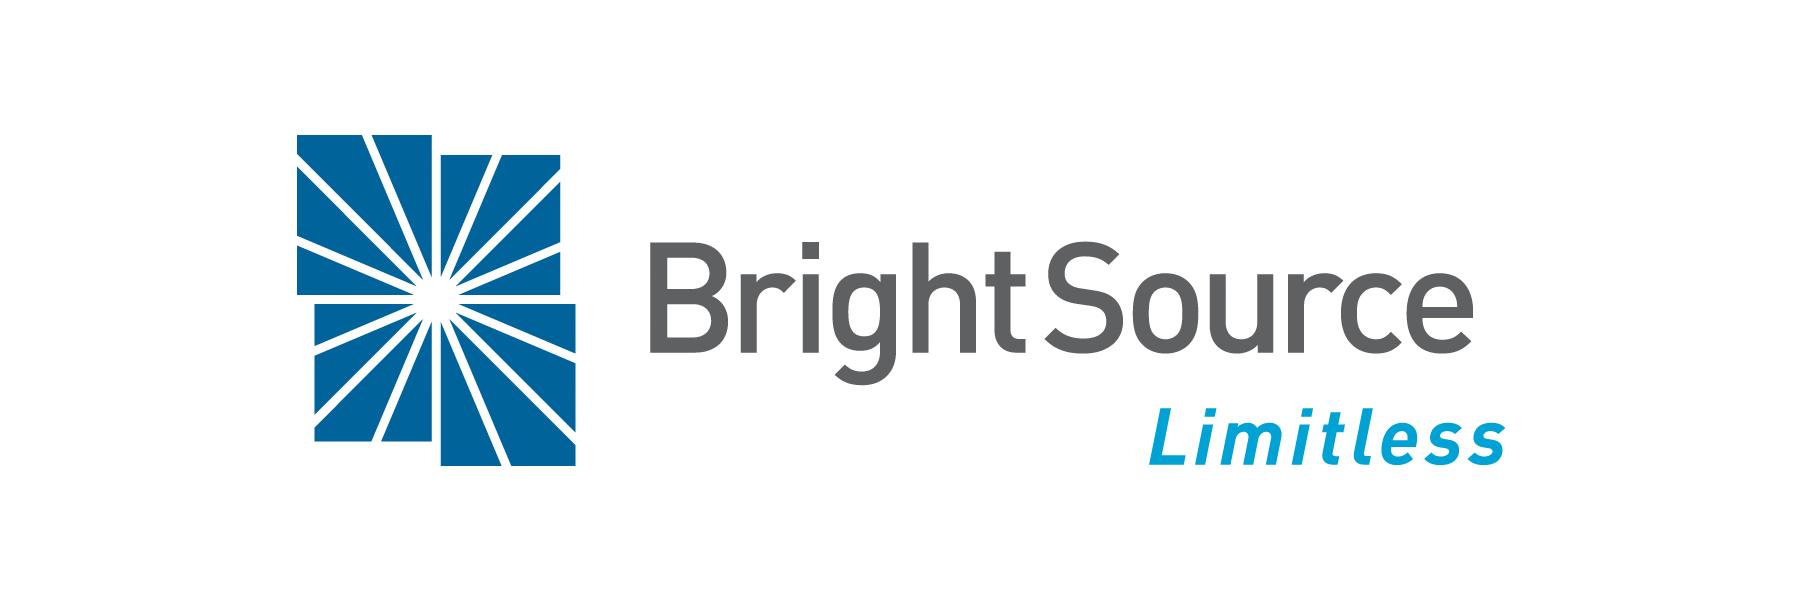 BrightSource Energy company logo